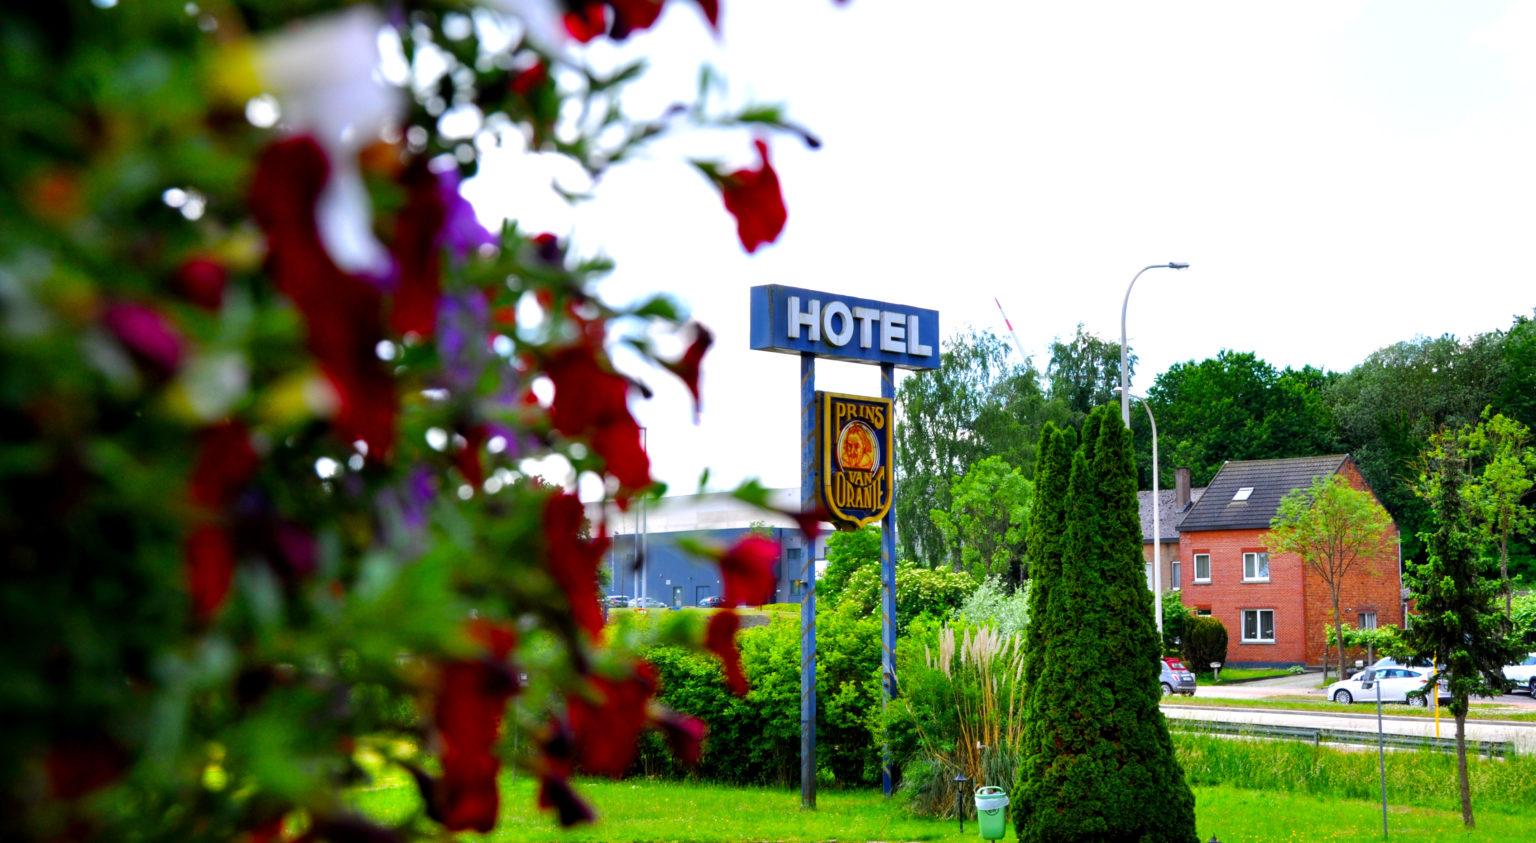 Hotel Prins van Oranje